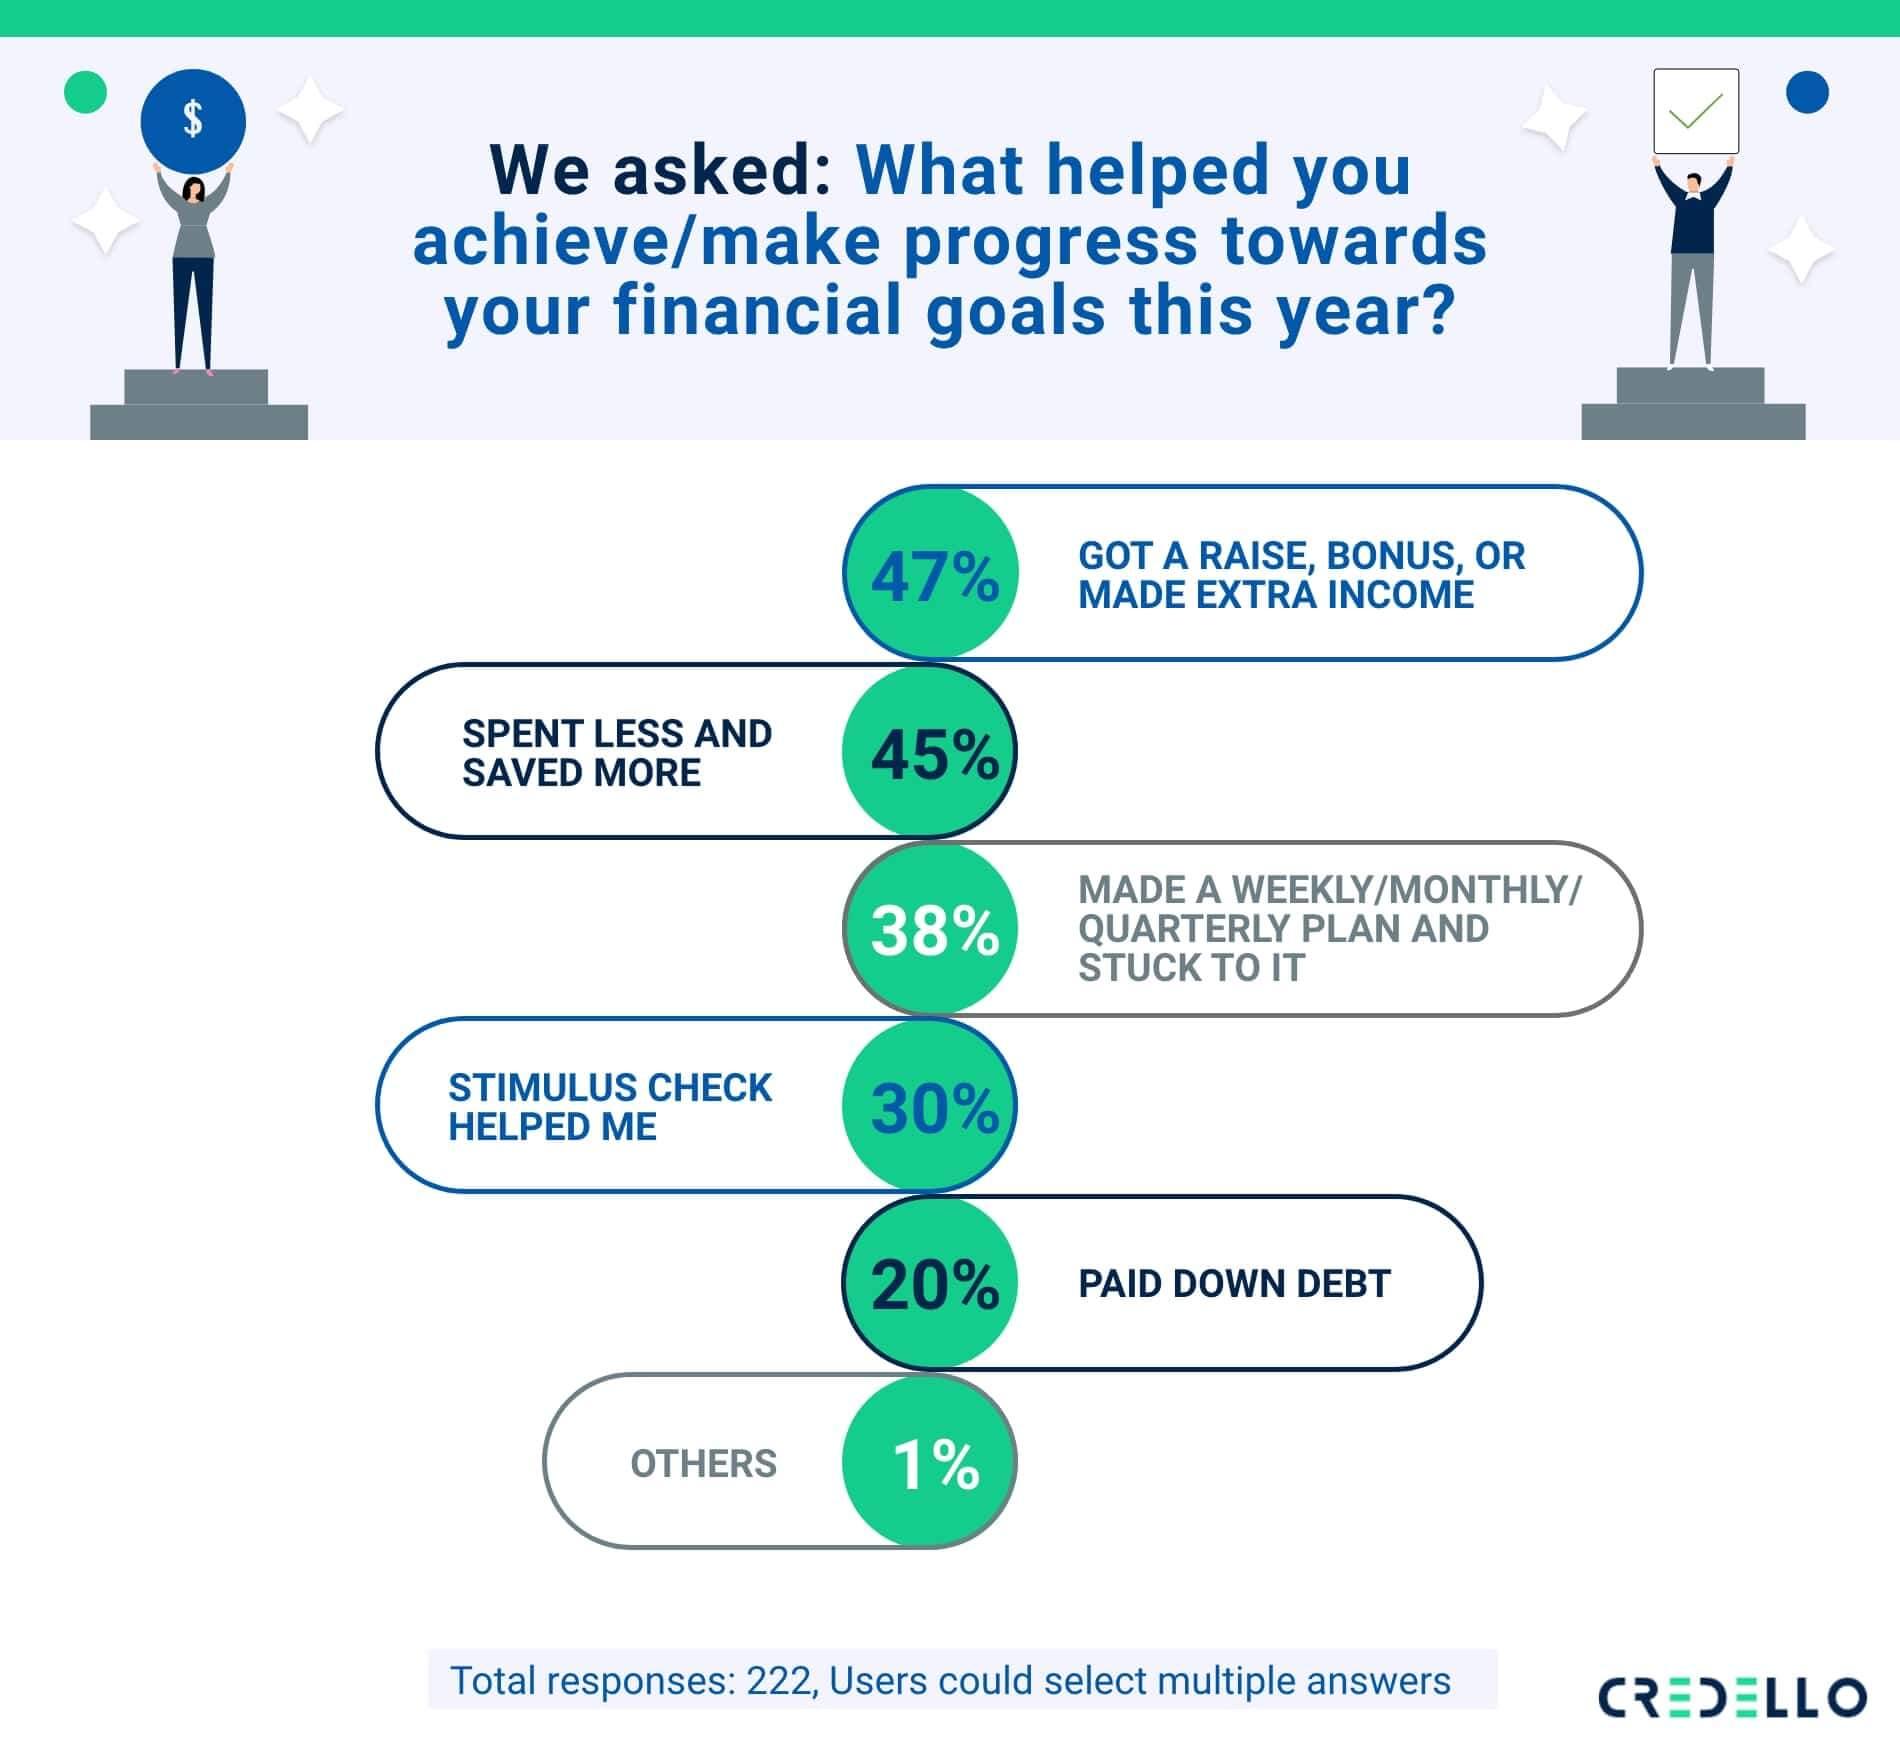 millennials status ontheir 2020 financialresolutions